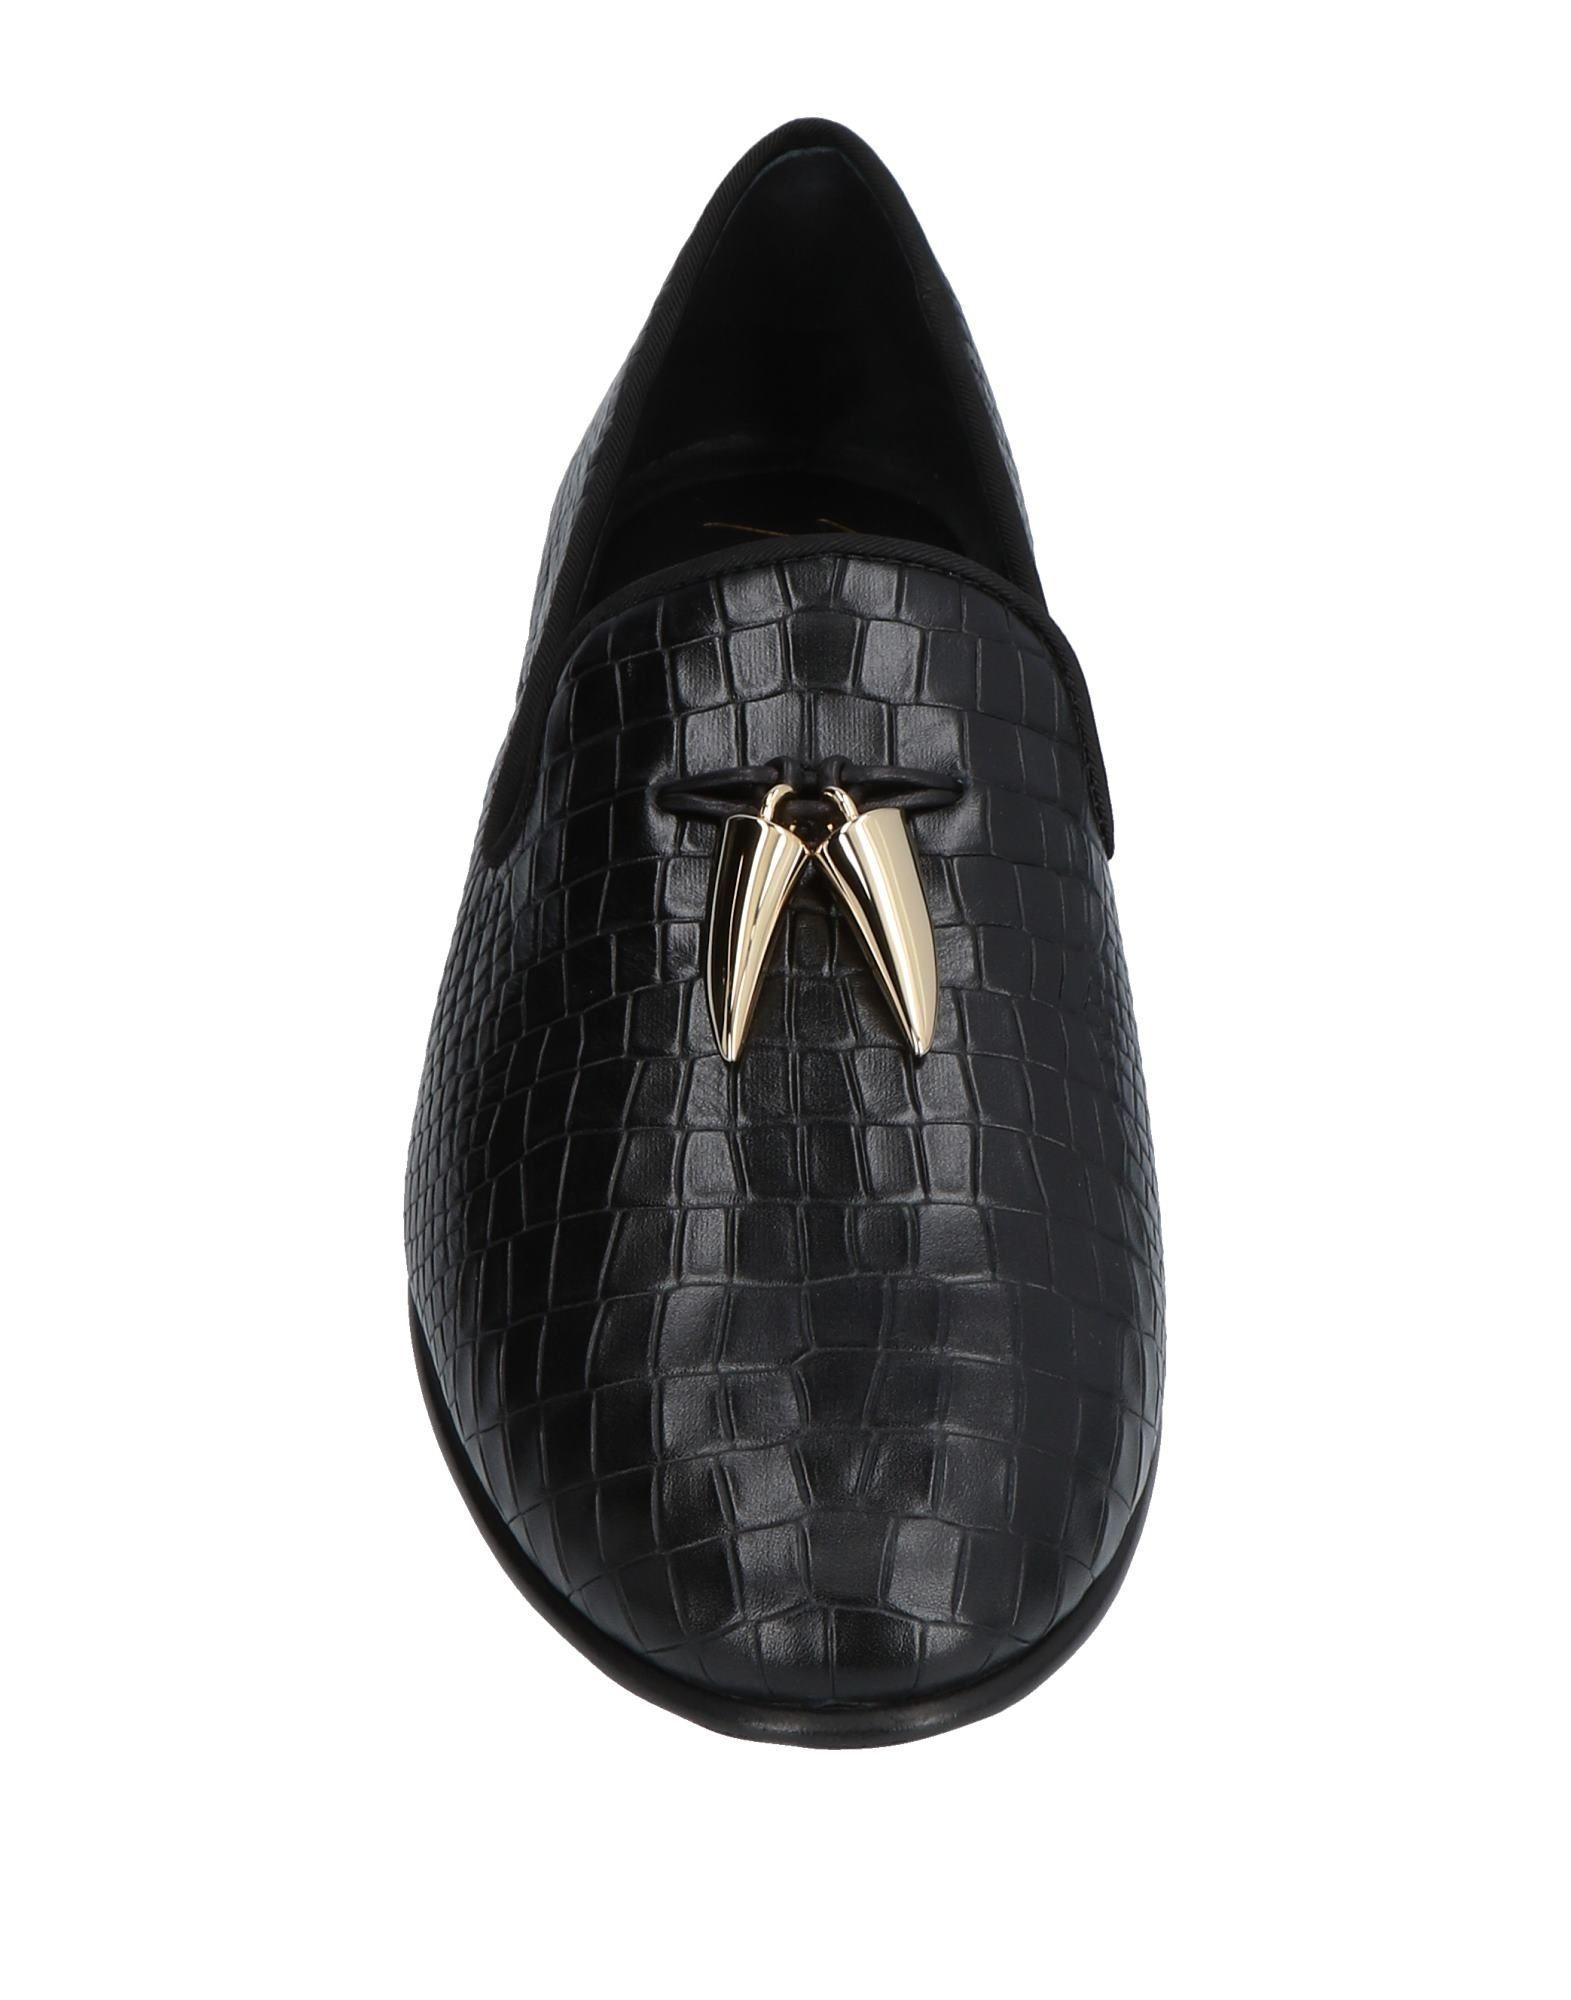 Giuseppe Zanotti Gute Mokassins Herren  11446104FT Gute Zanotti Qualität beliebte Schuhe eb7280